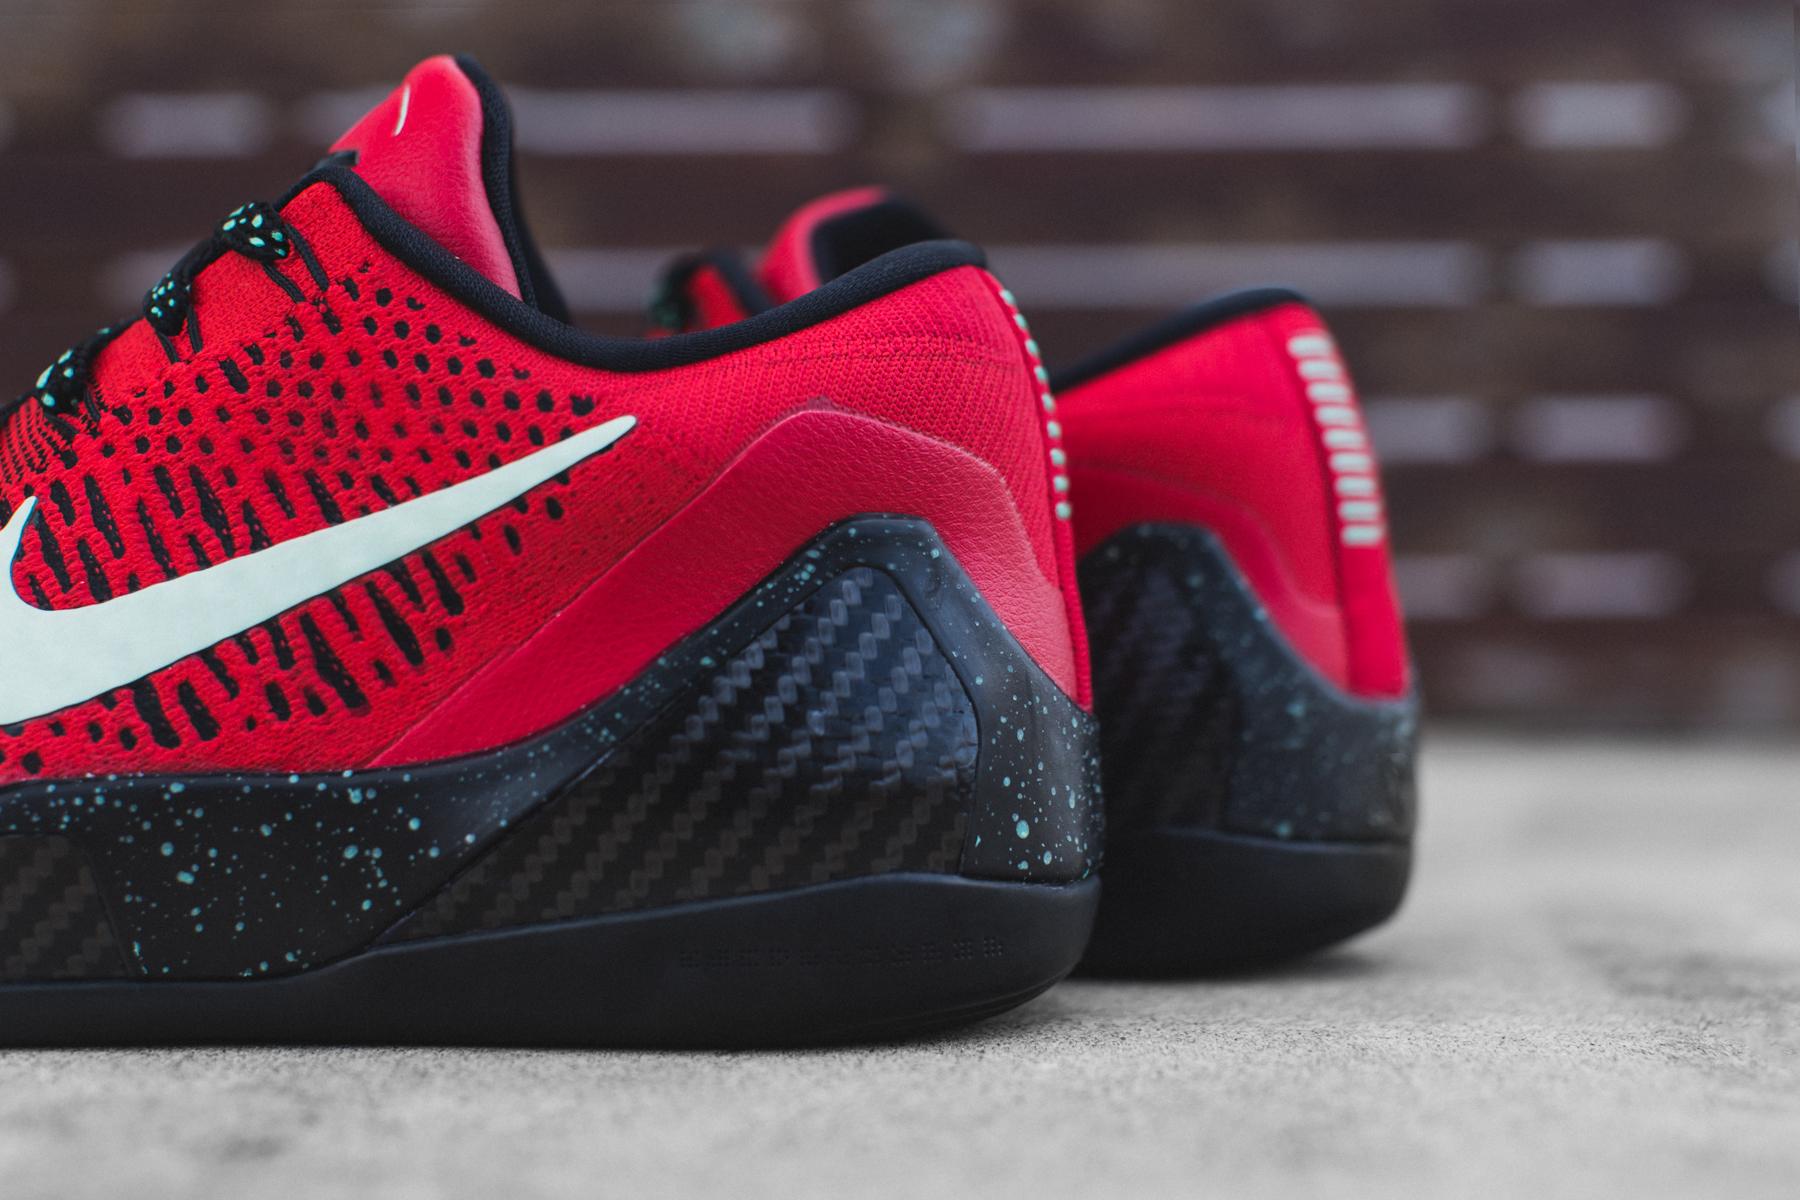 Nike Kobe 9 Elite Low University Red/Black